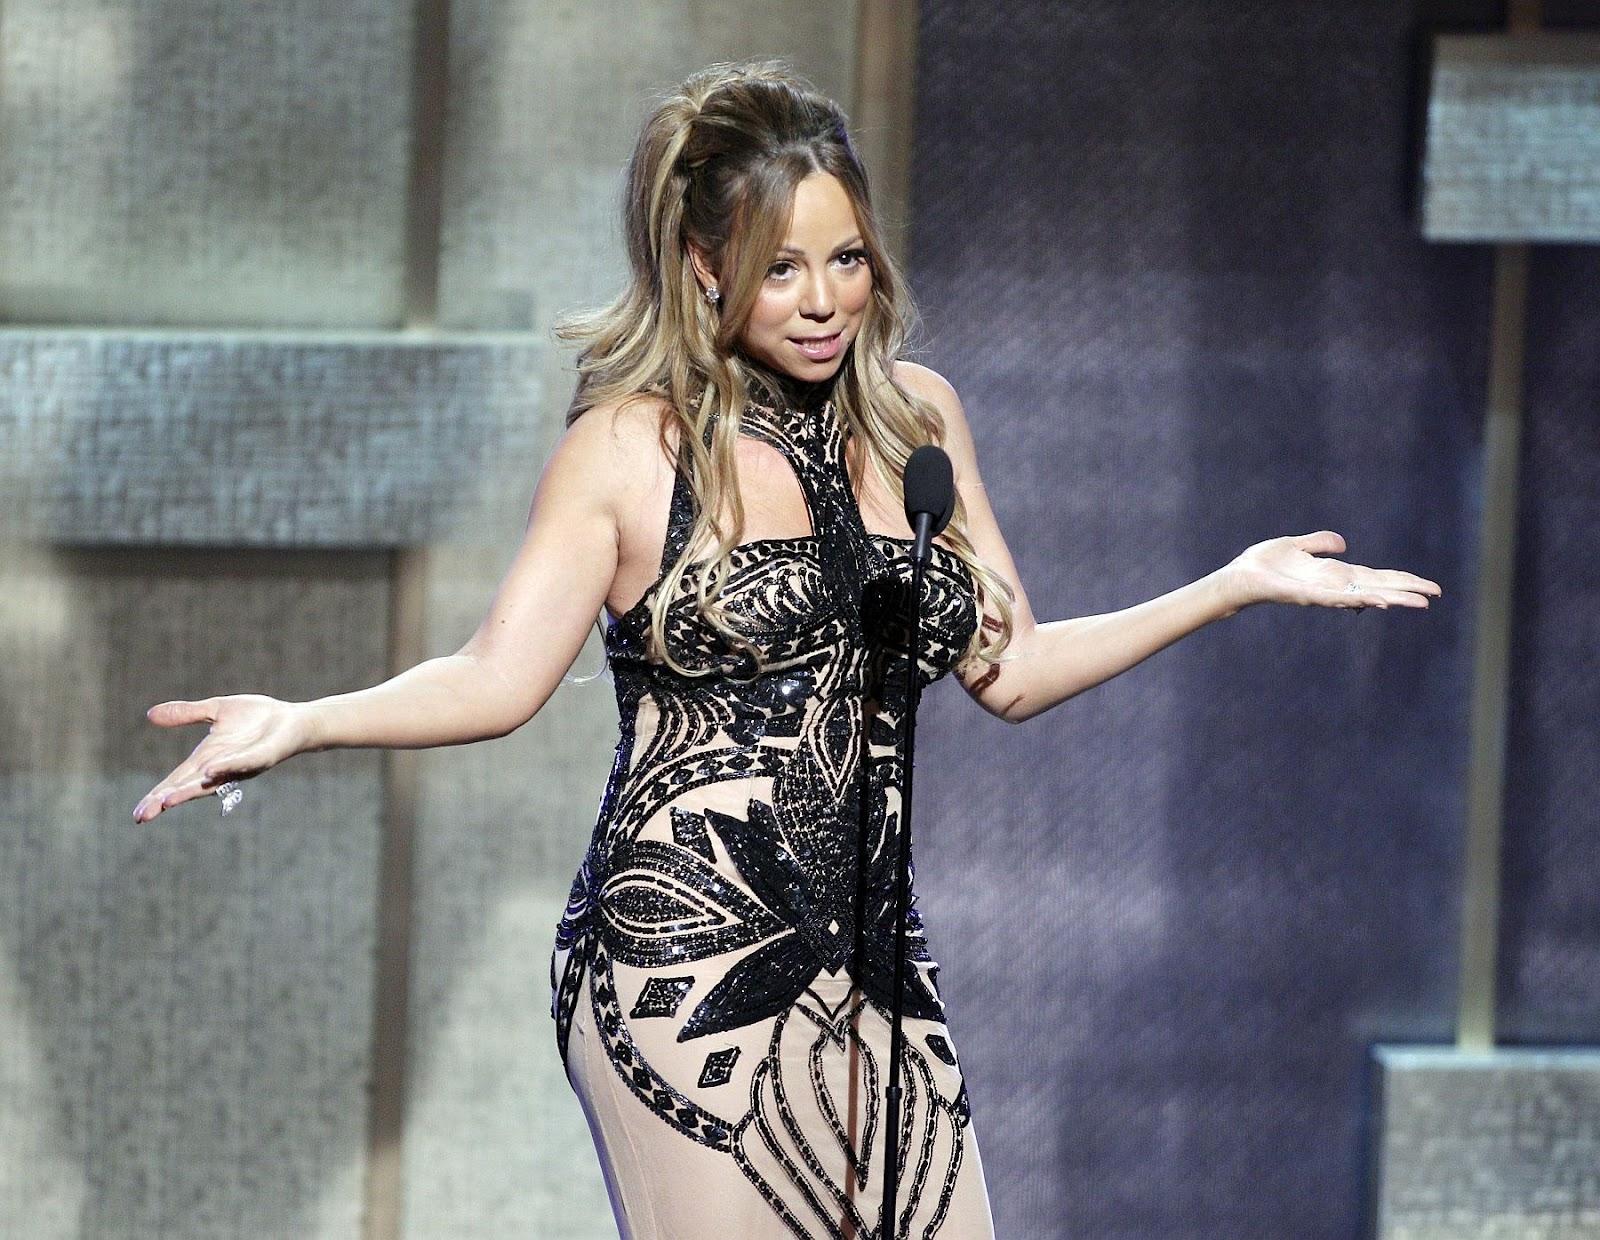 http://1.bp.blogspot.com/-QMoaaWy8YU4/T0eGdC3LX7I/AAAAAAAAM4g/nFfTu_E3-SU/s1600/Mariah+Carey5.jpg